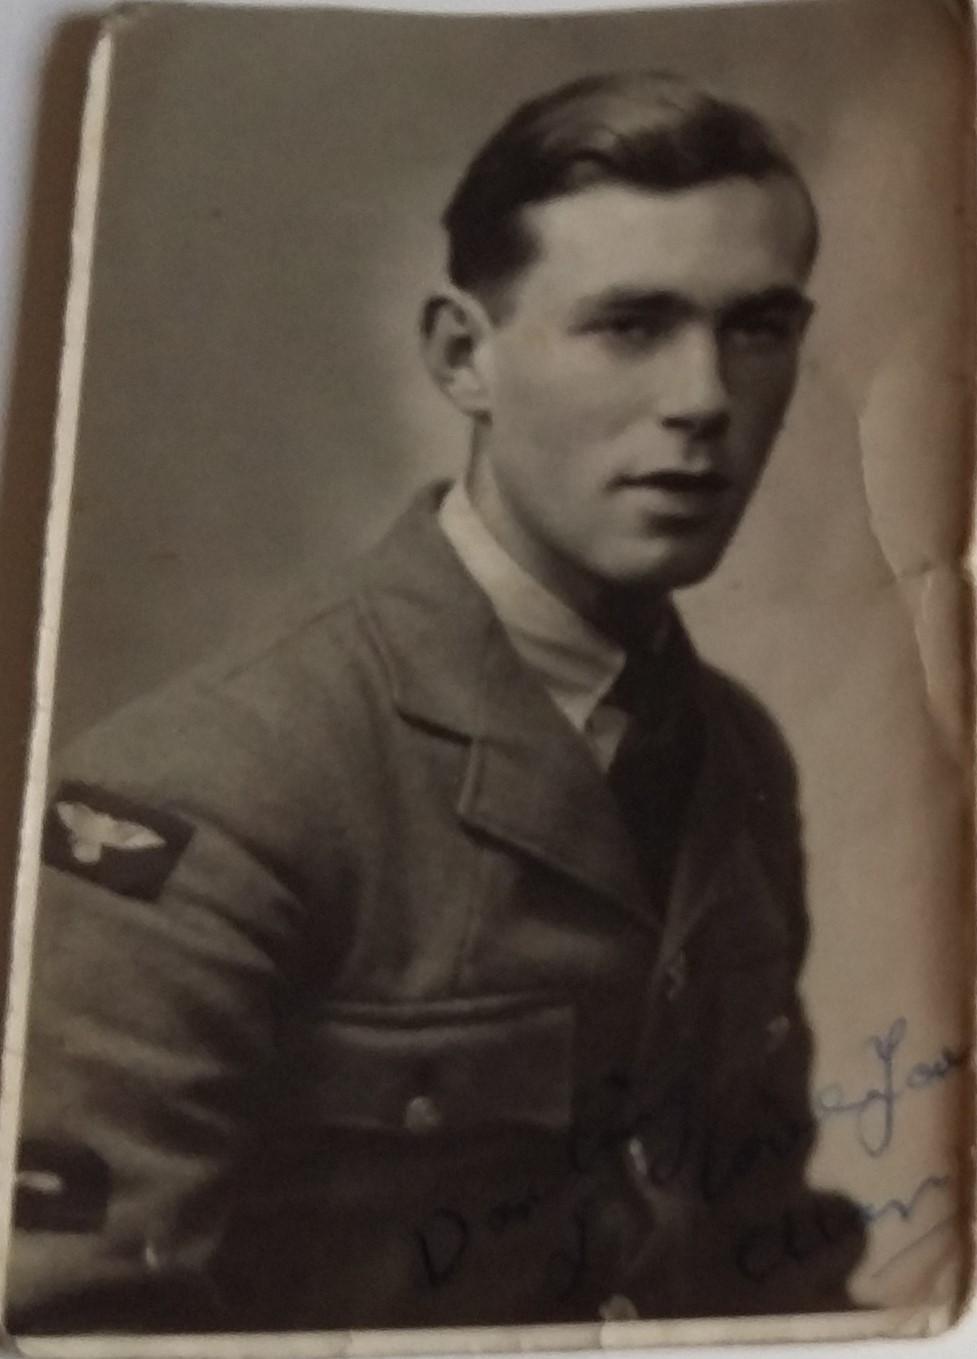 Alan Lacy, 1941